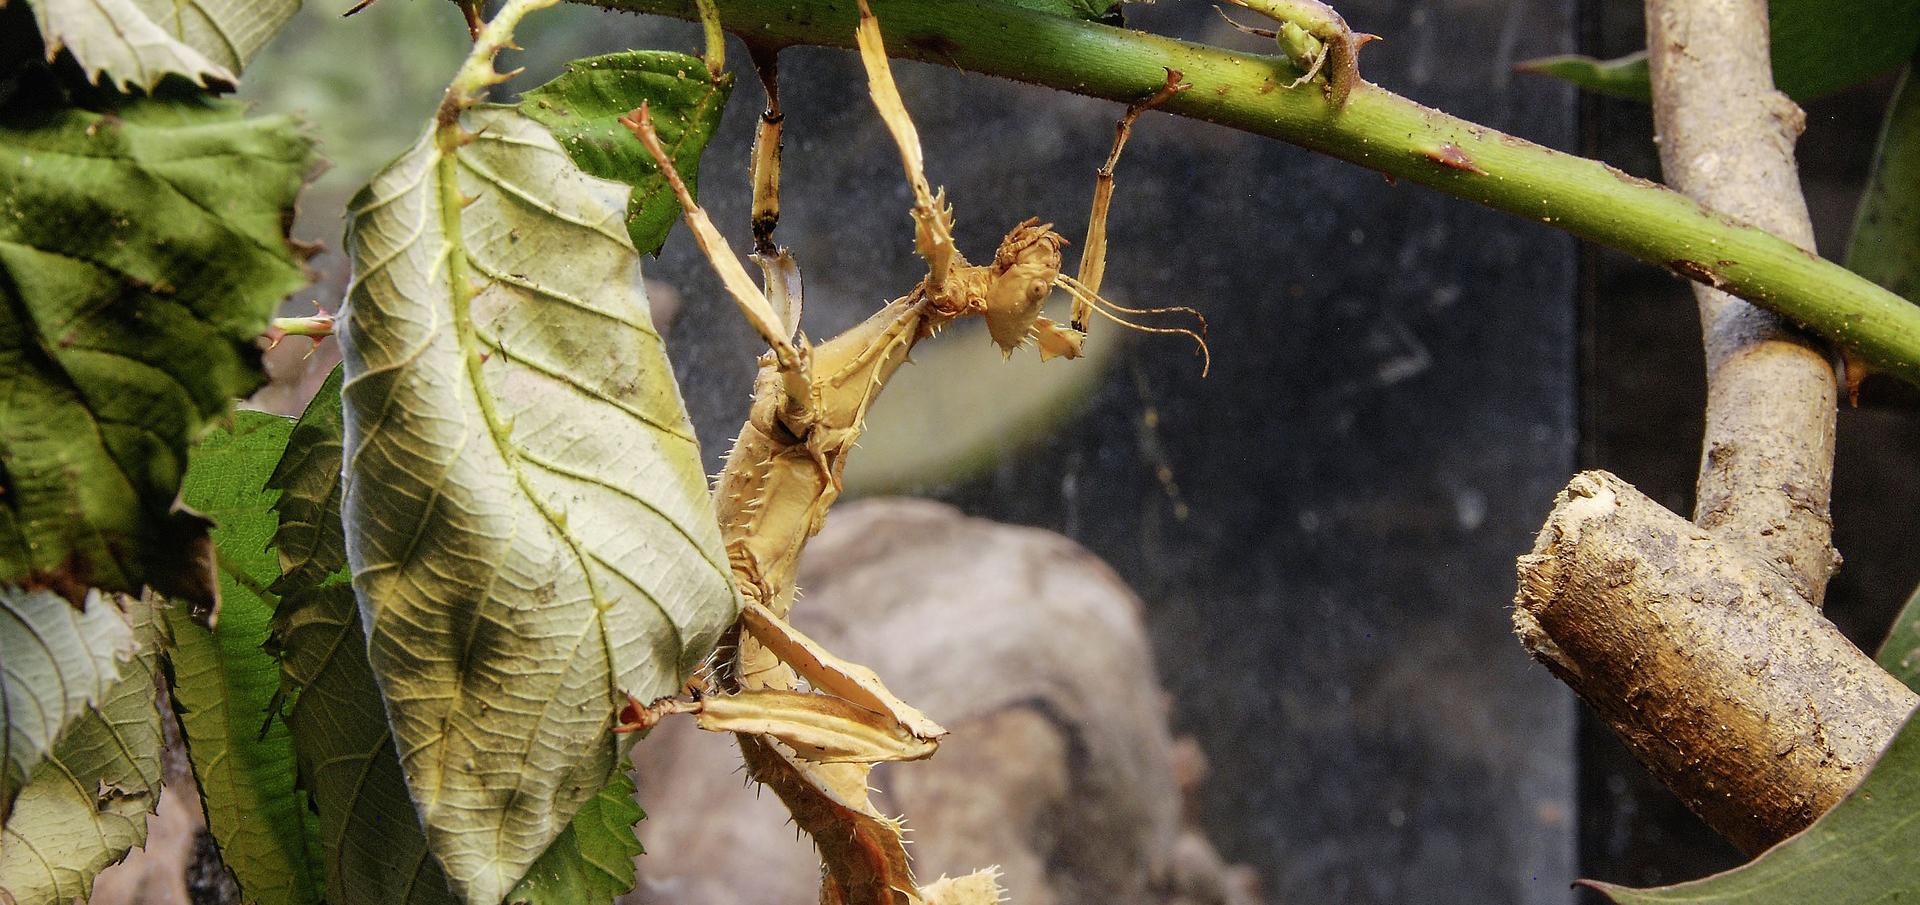 10 insectos raros que parecen extraterrestres